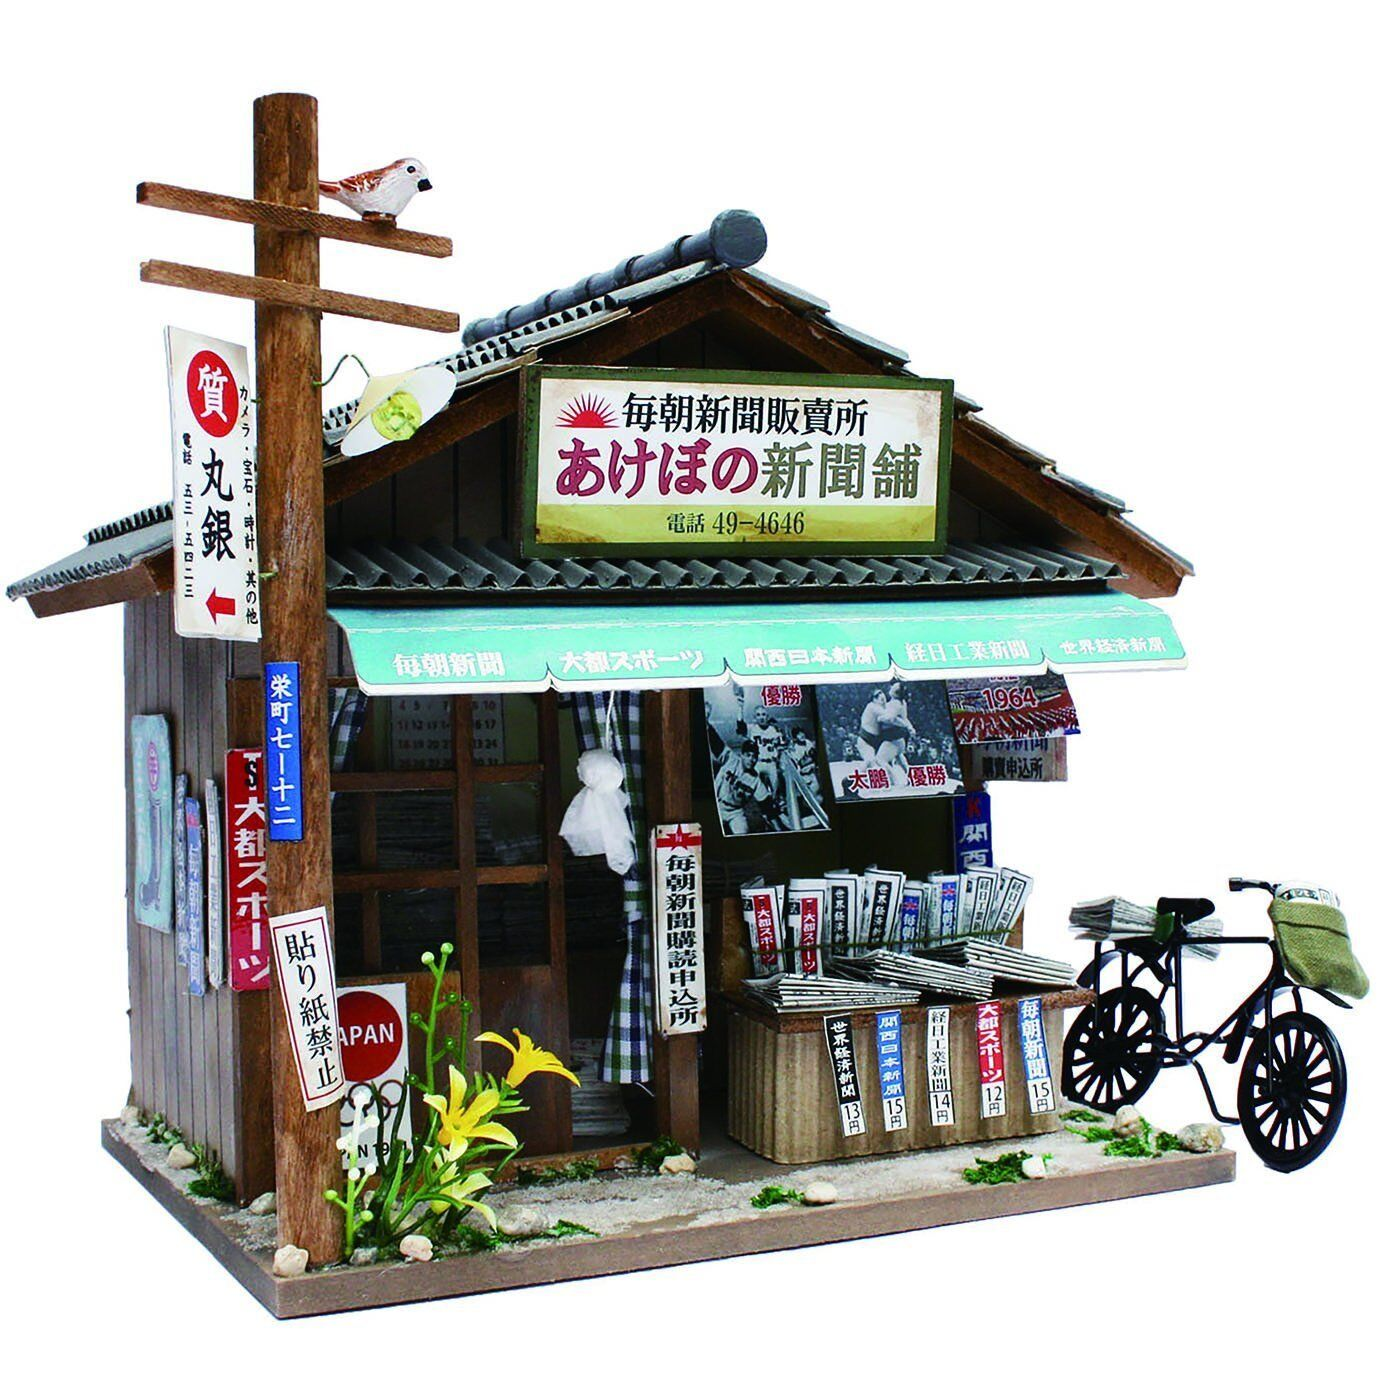 8534 Billy Handmade Dollhouse Japanese Newspaper Shop Showa Series